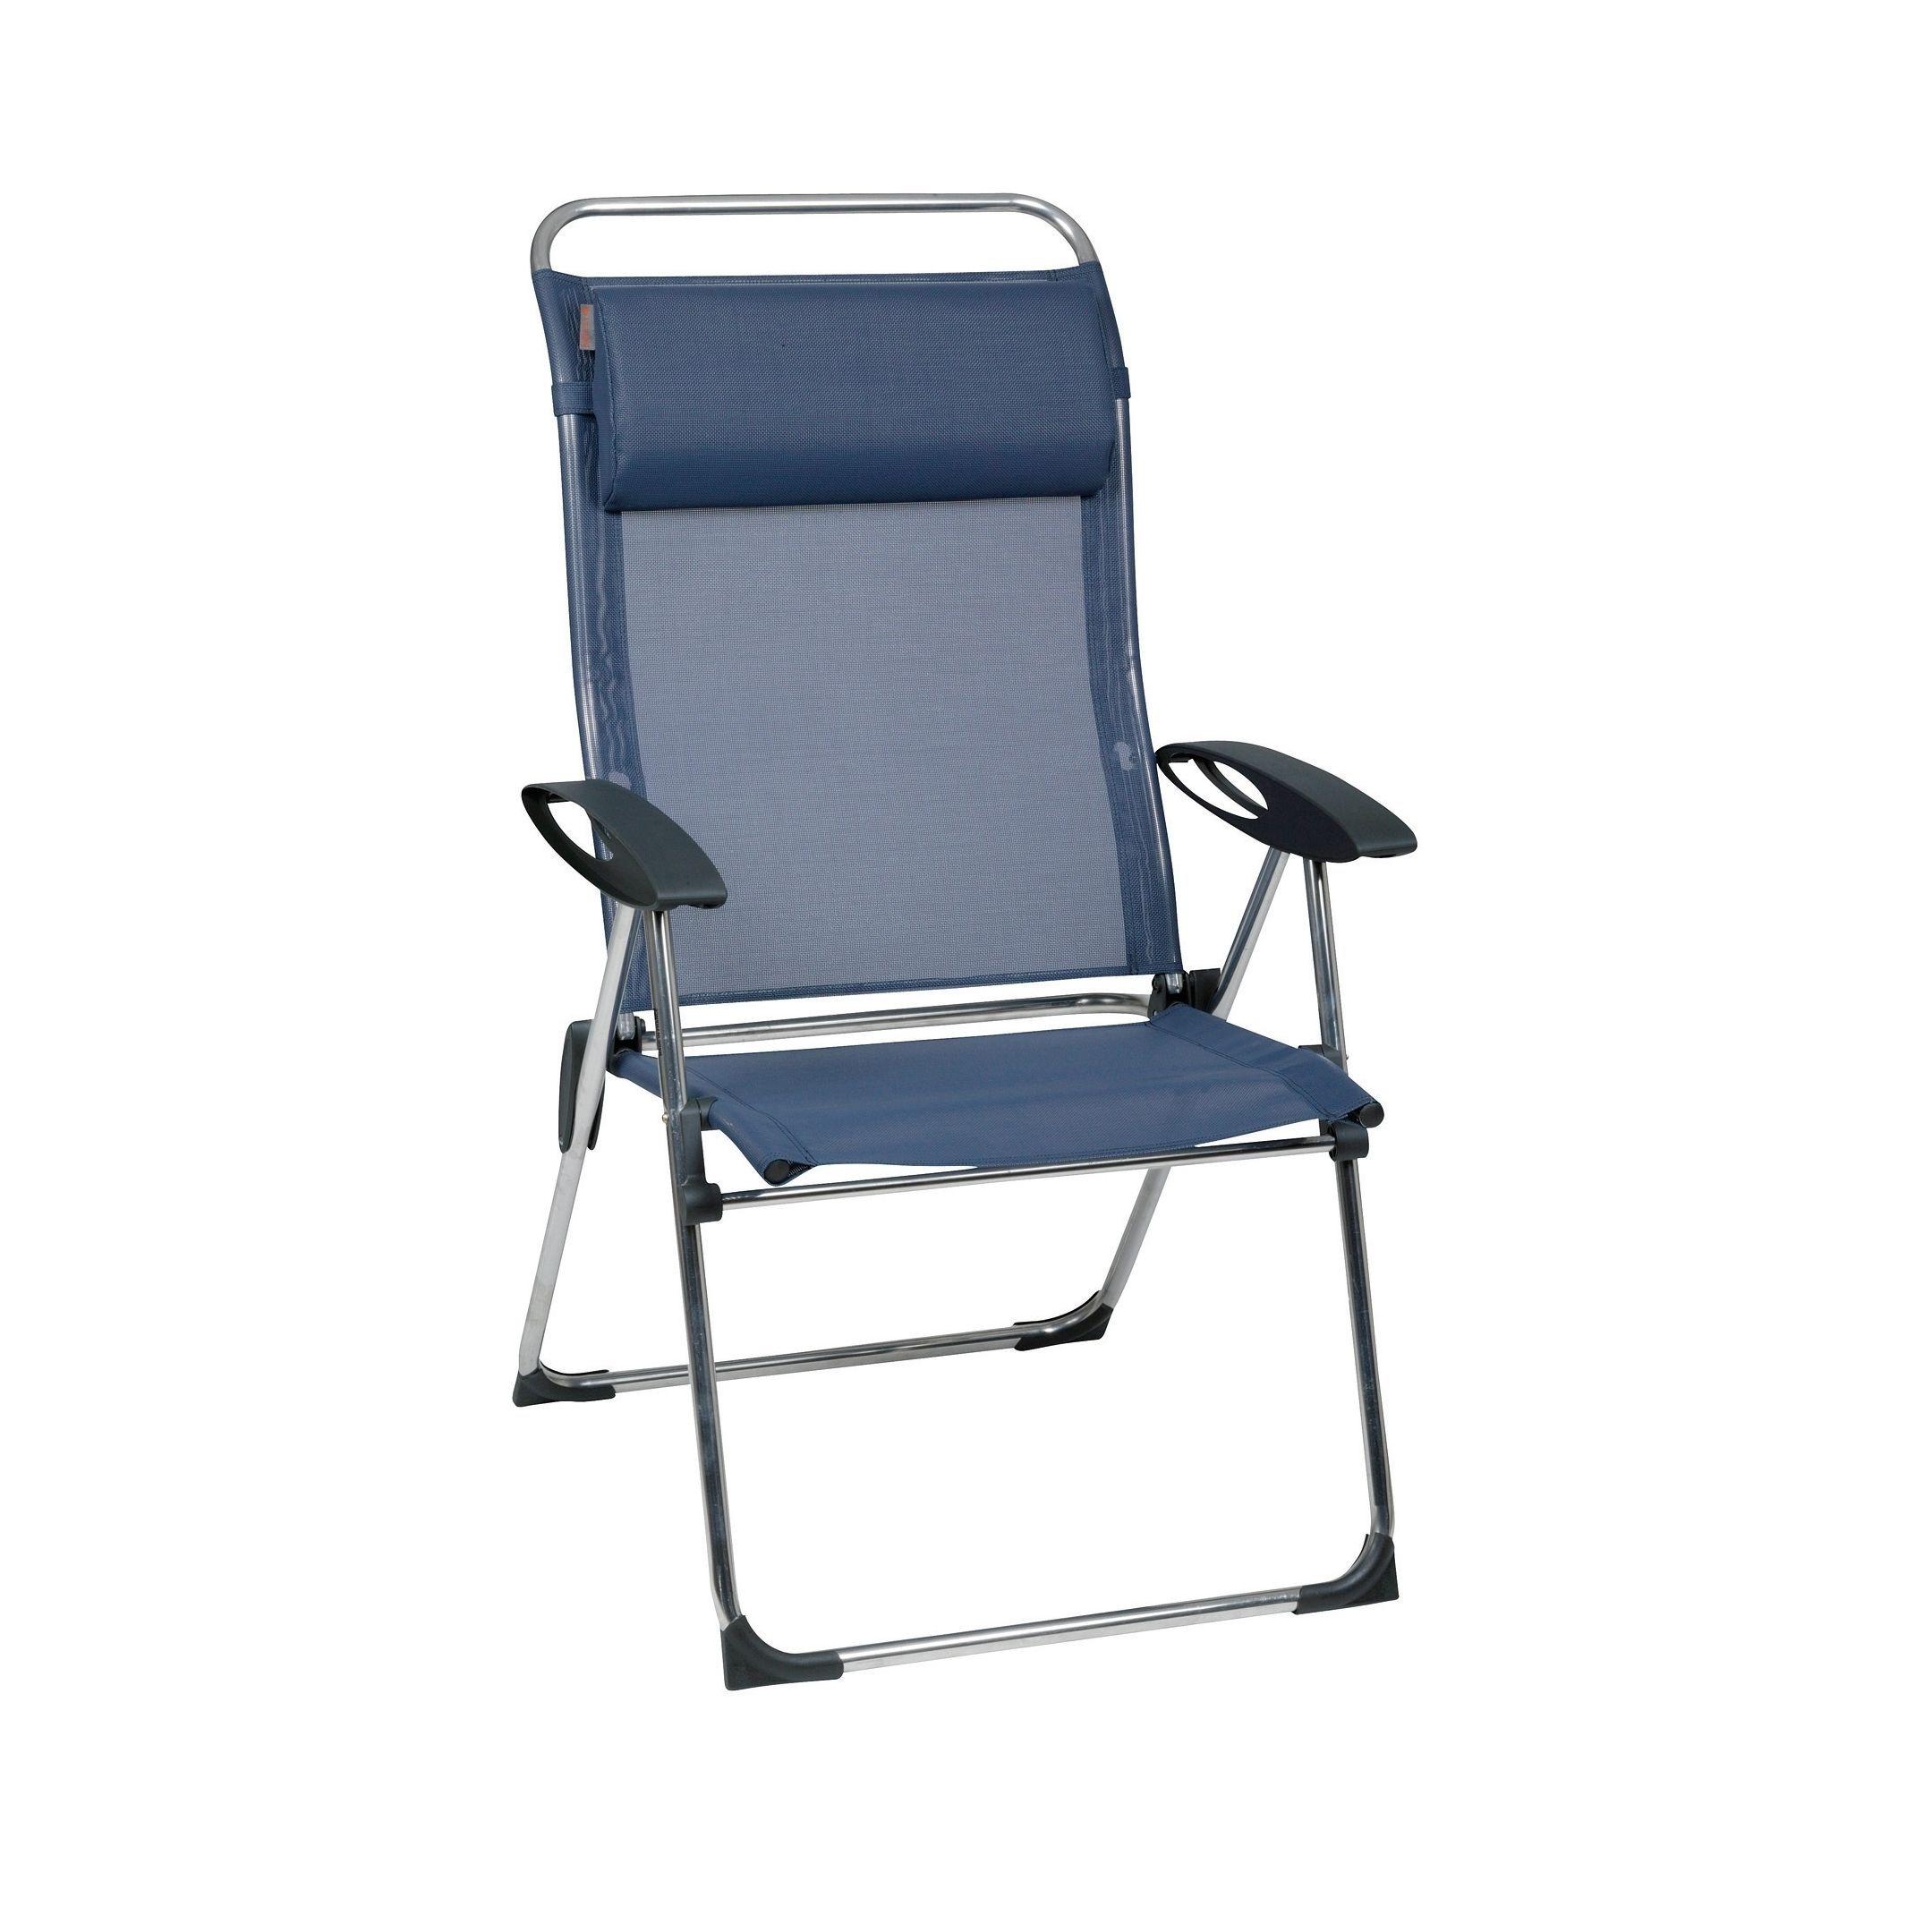 Lafuma ChamElips XL Folding Chair | Products | Pinterest